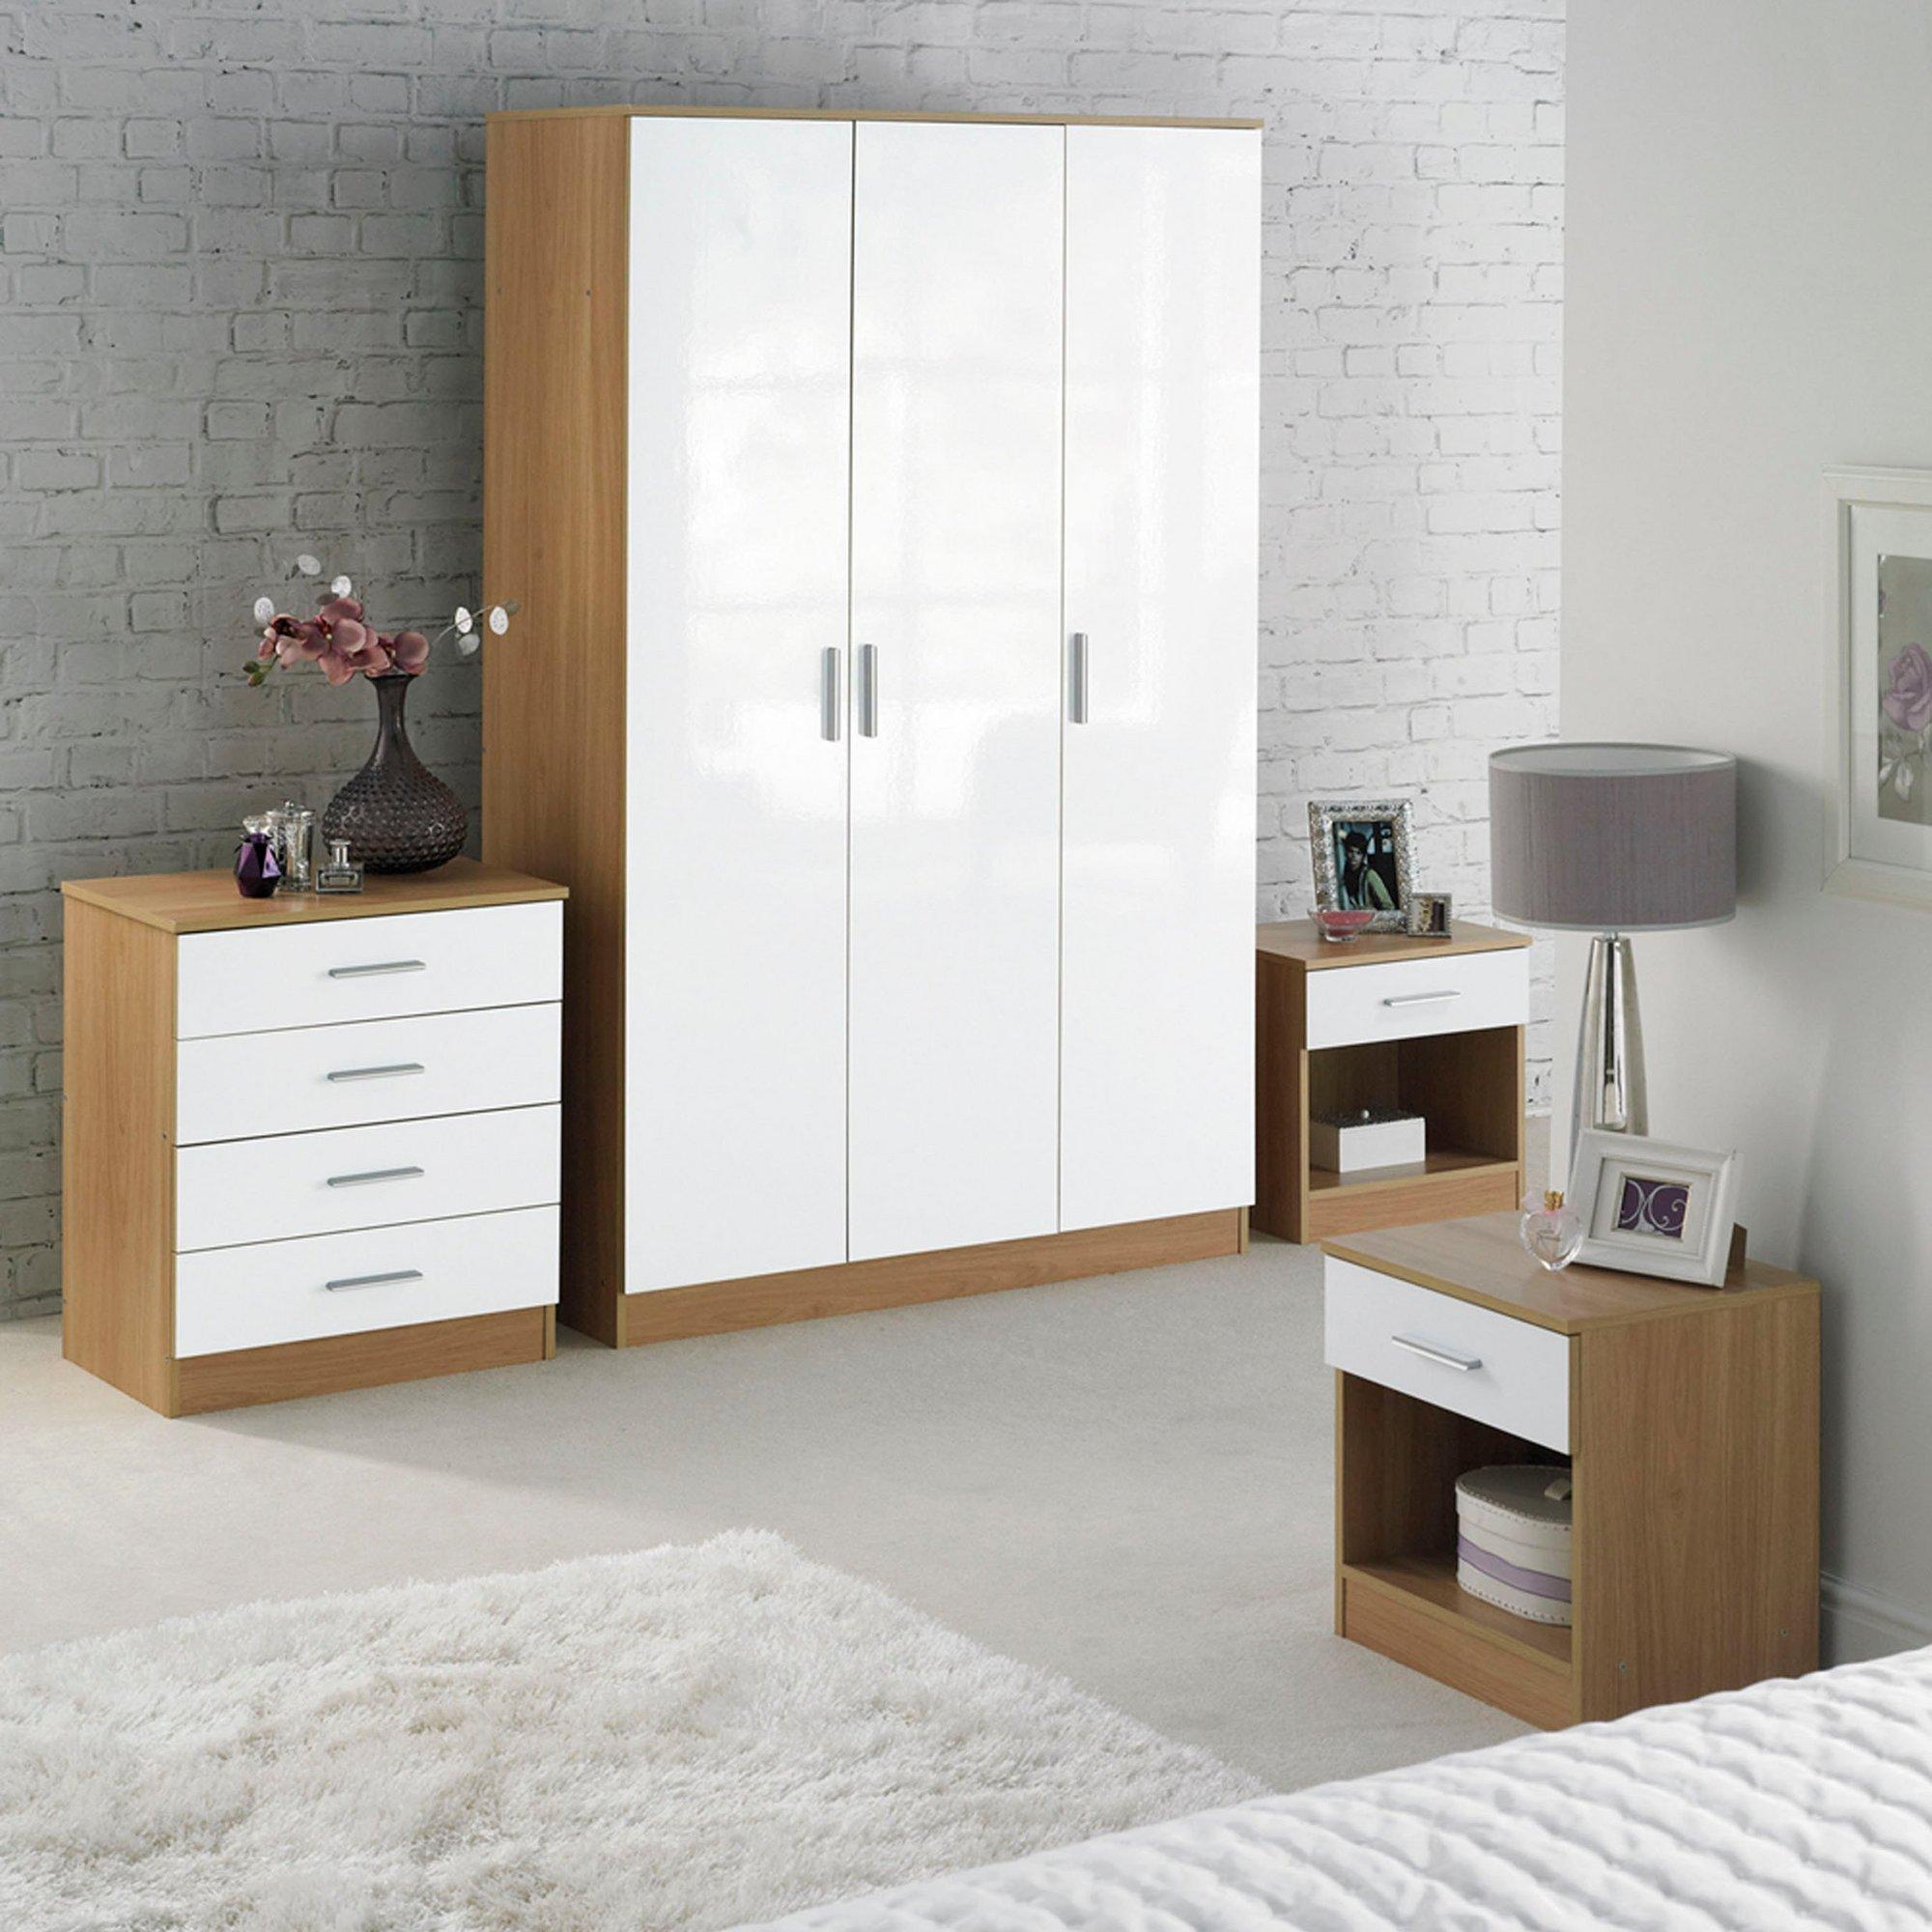 Image of Carleton 4-Piece High-Gloss Bedroom Set